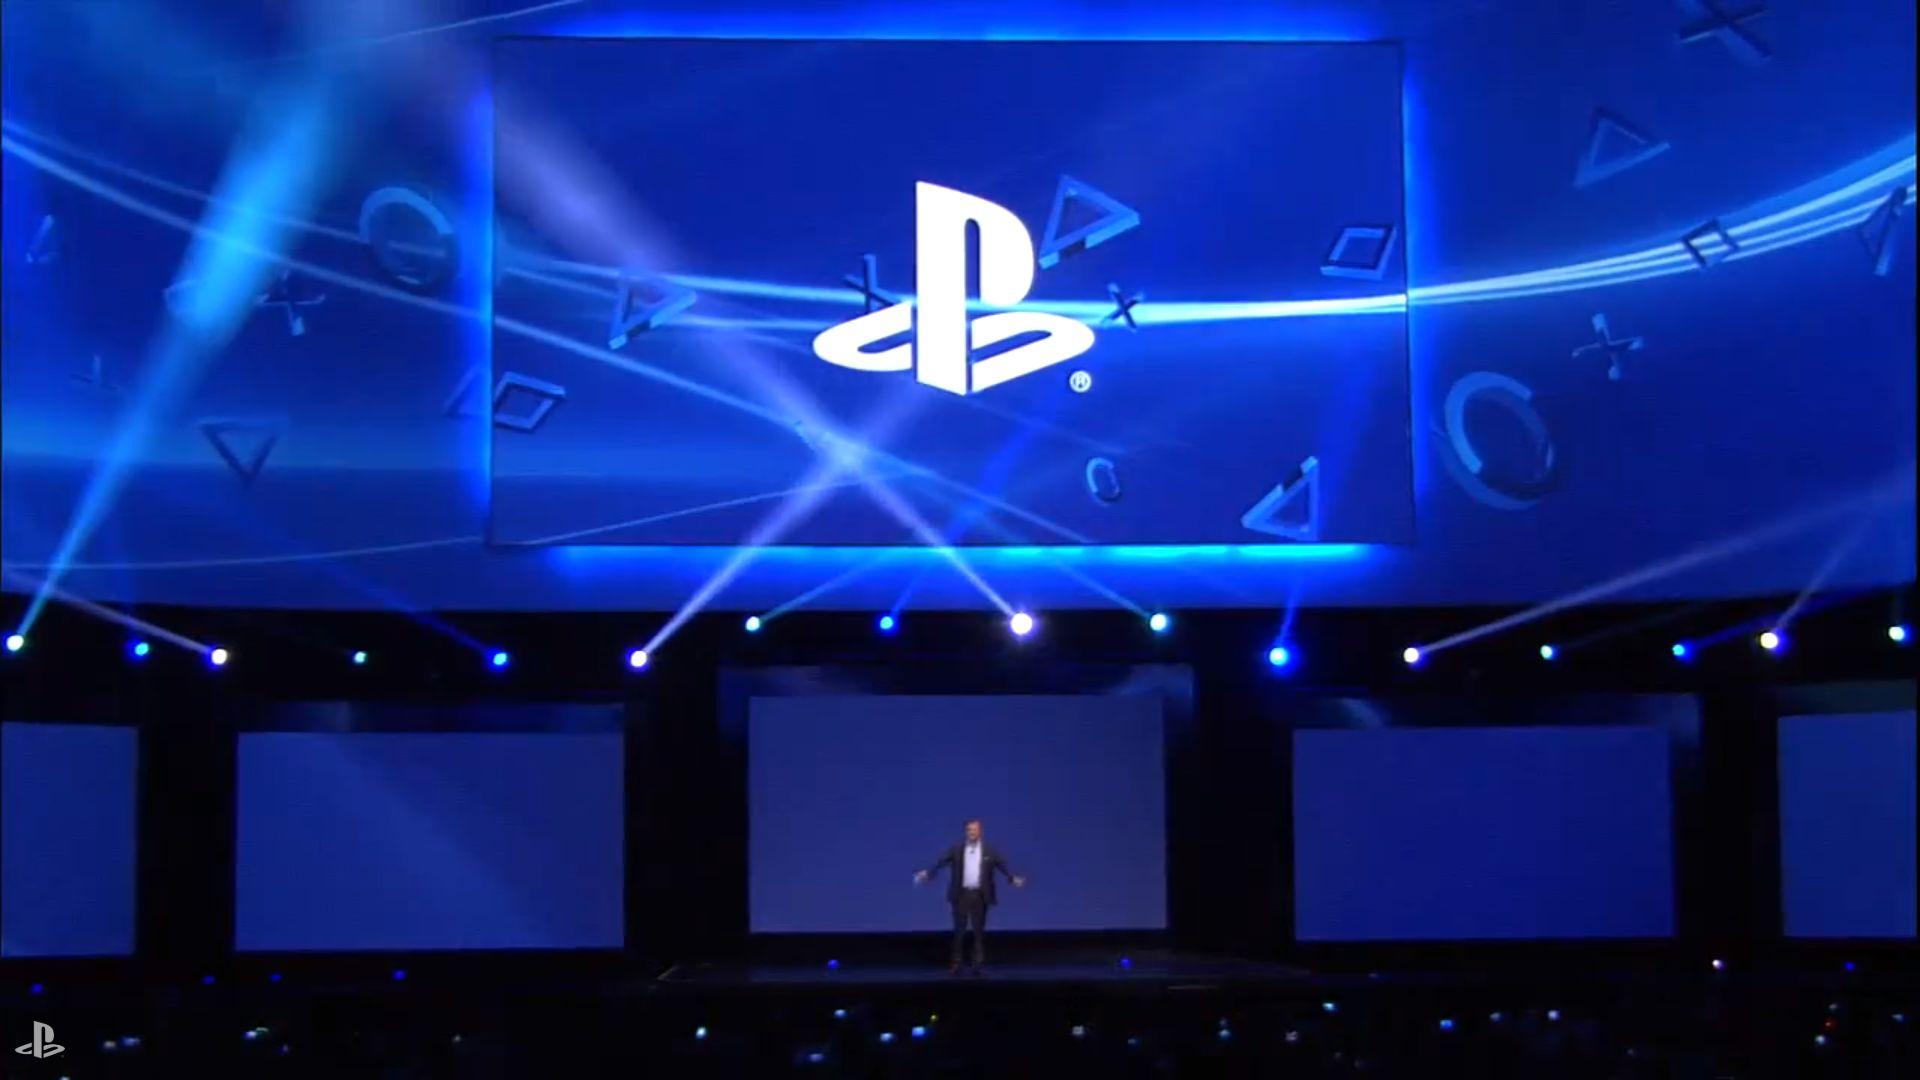 Sony Playstation, E3 2018, SIE